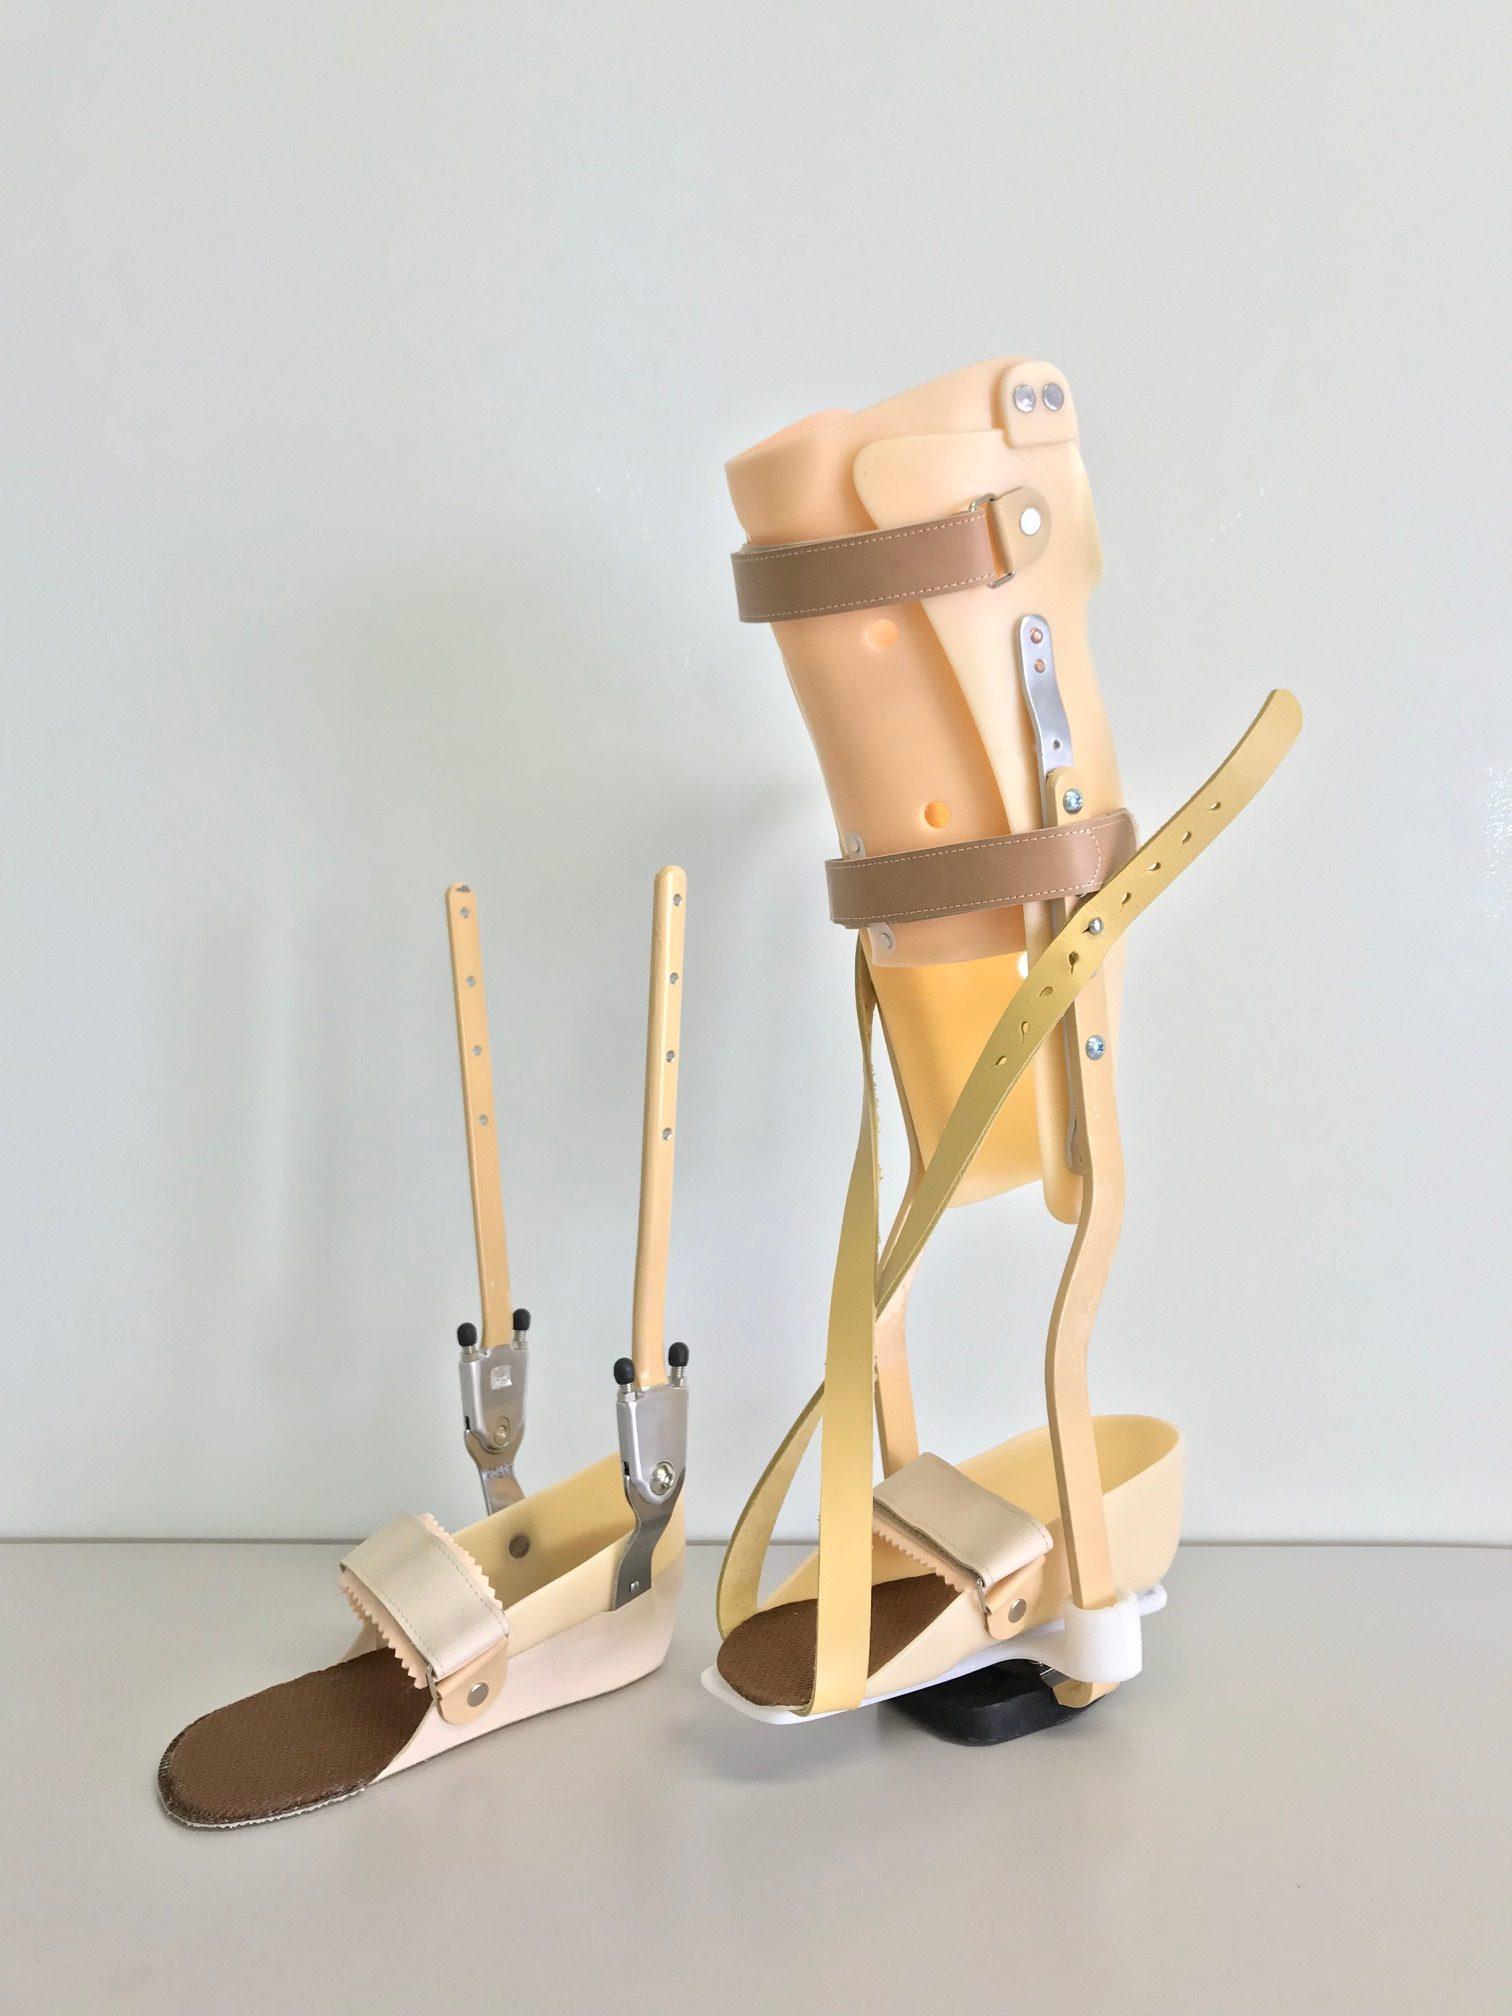 PTB短下肢装具の画像